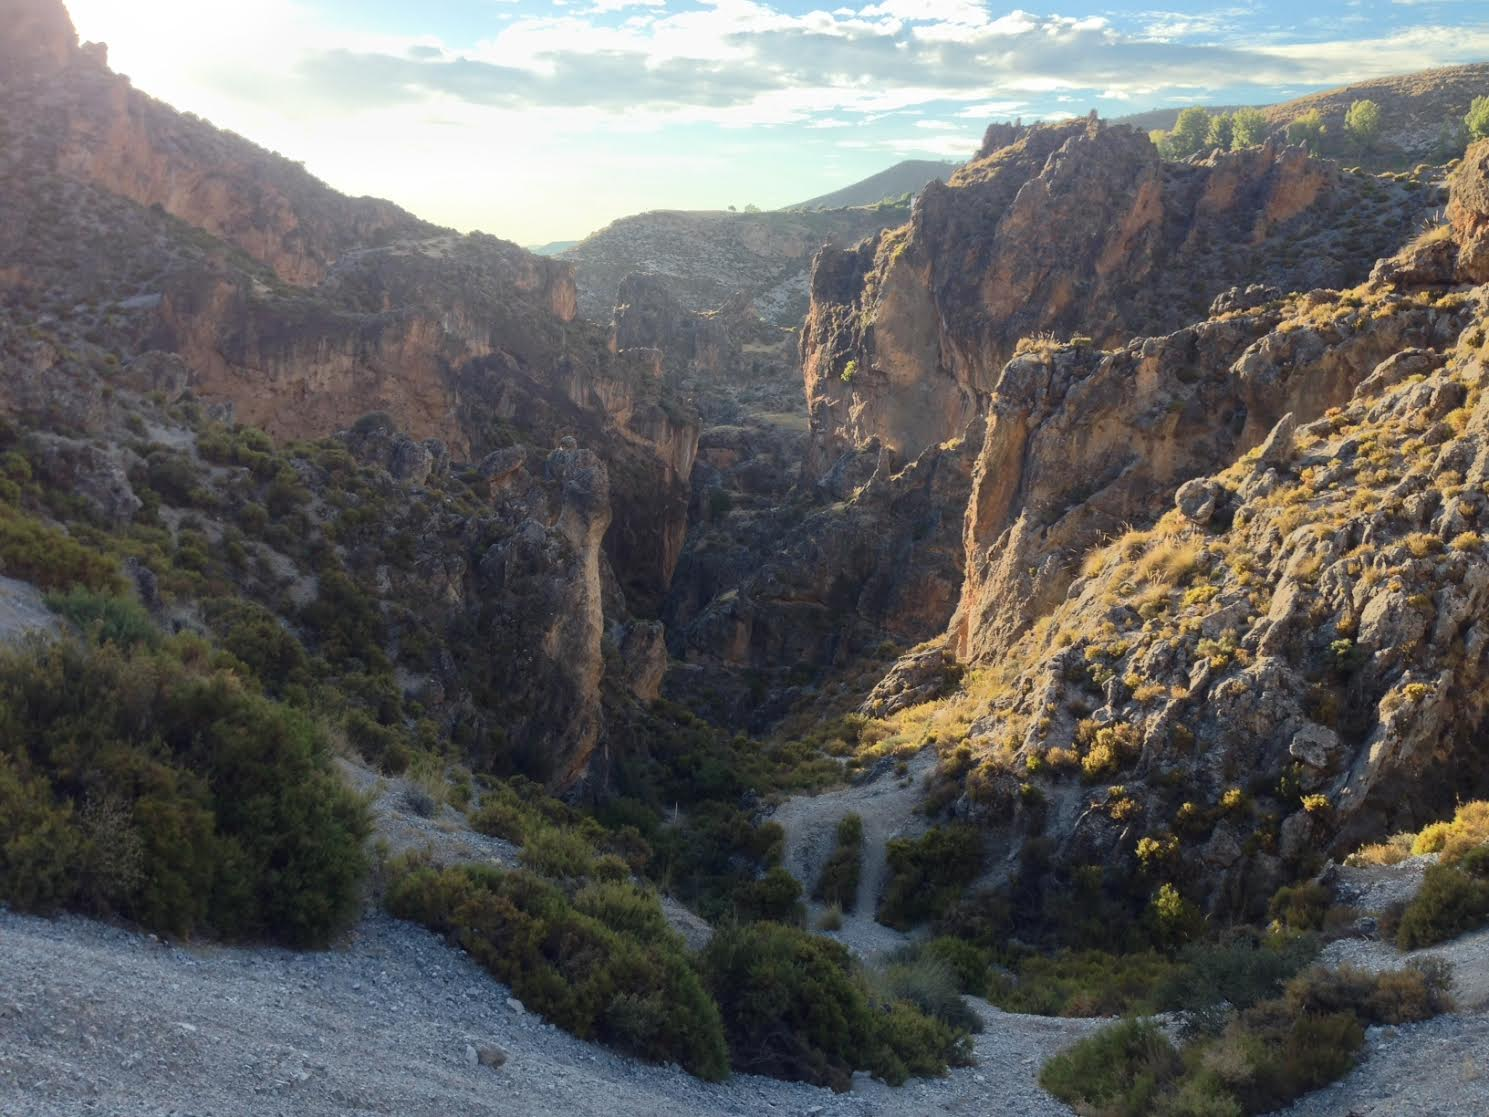 Spain's Sierra Nevada National Park.